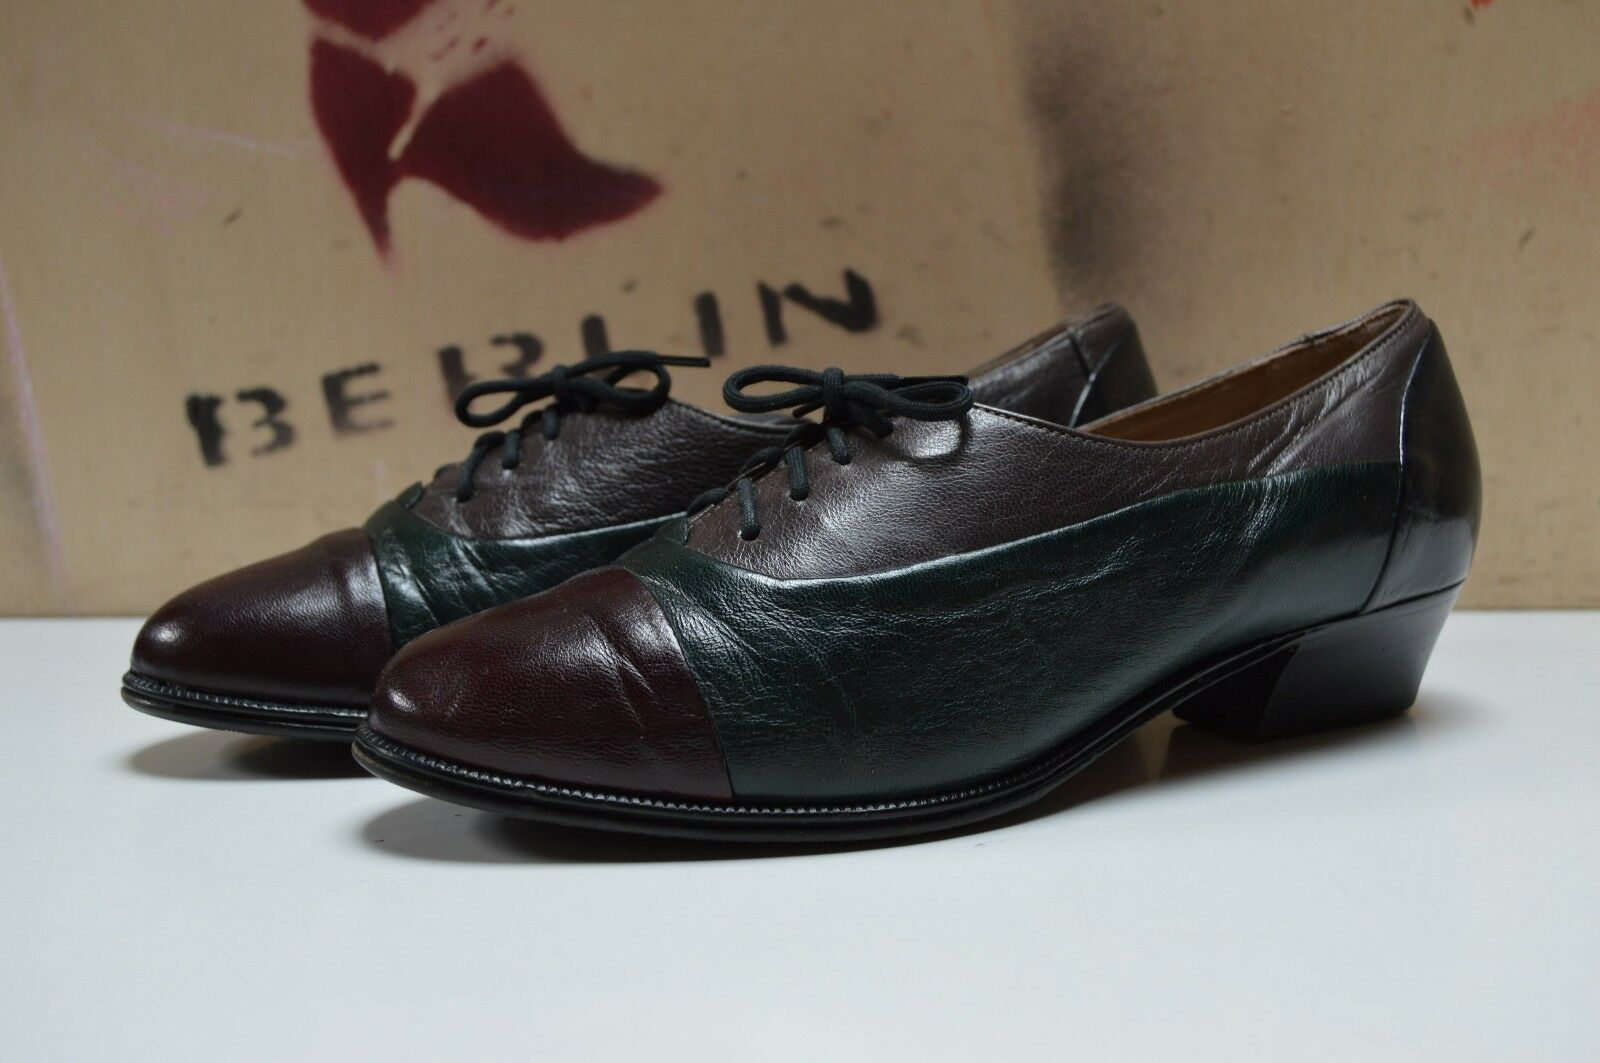 Sioux Sioux Sioux schnürzapatos zapato bajo verdadera a mano True vintage UK 4,5 ballerias  Venta en línea de descuento de fábrica